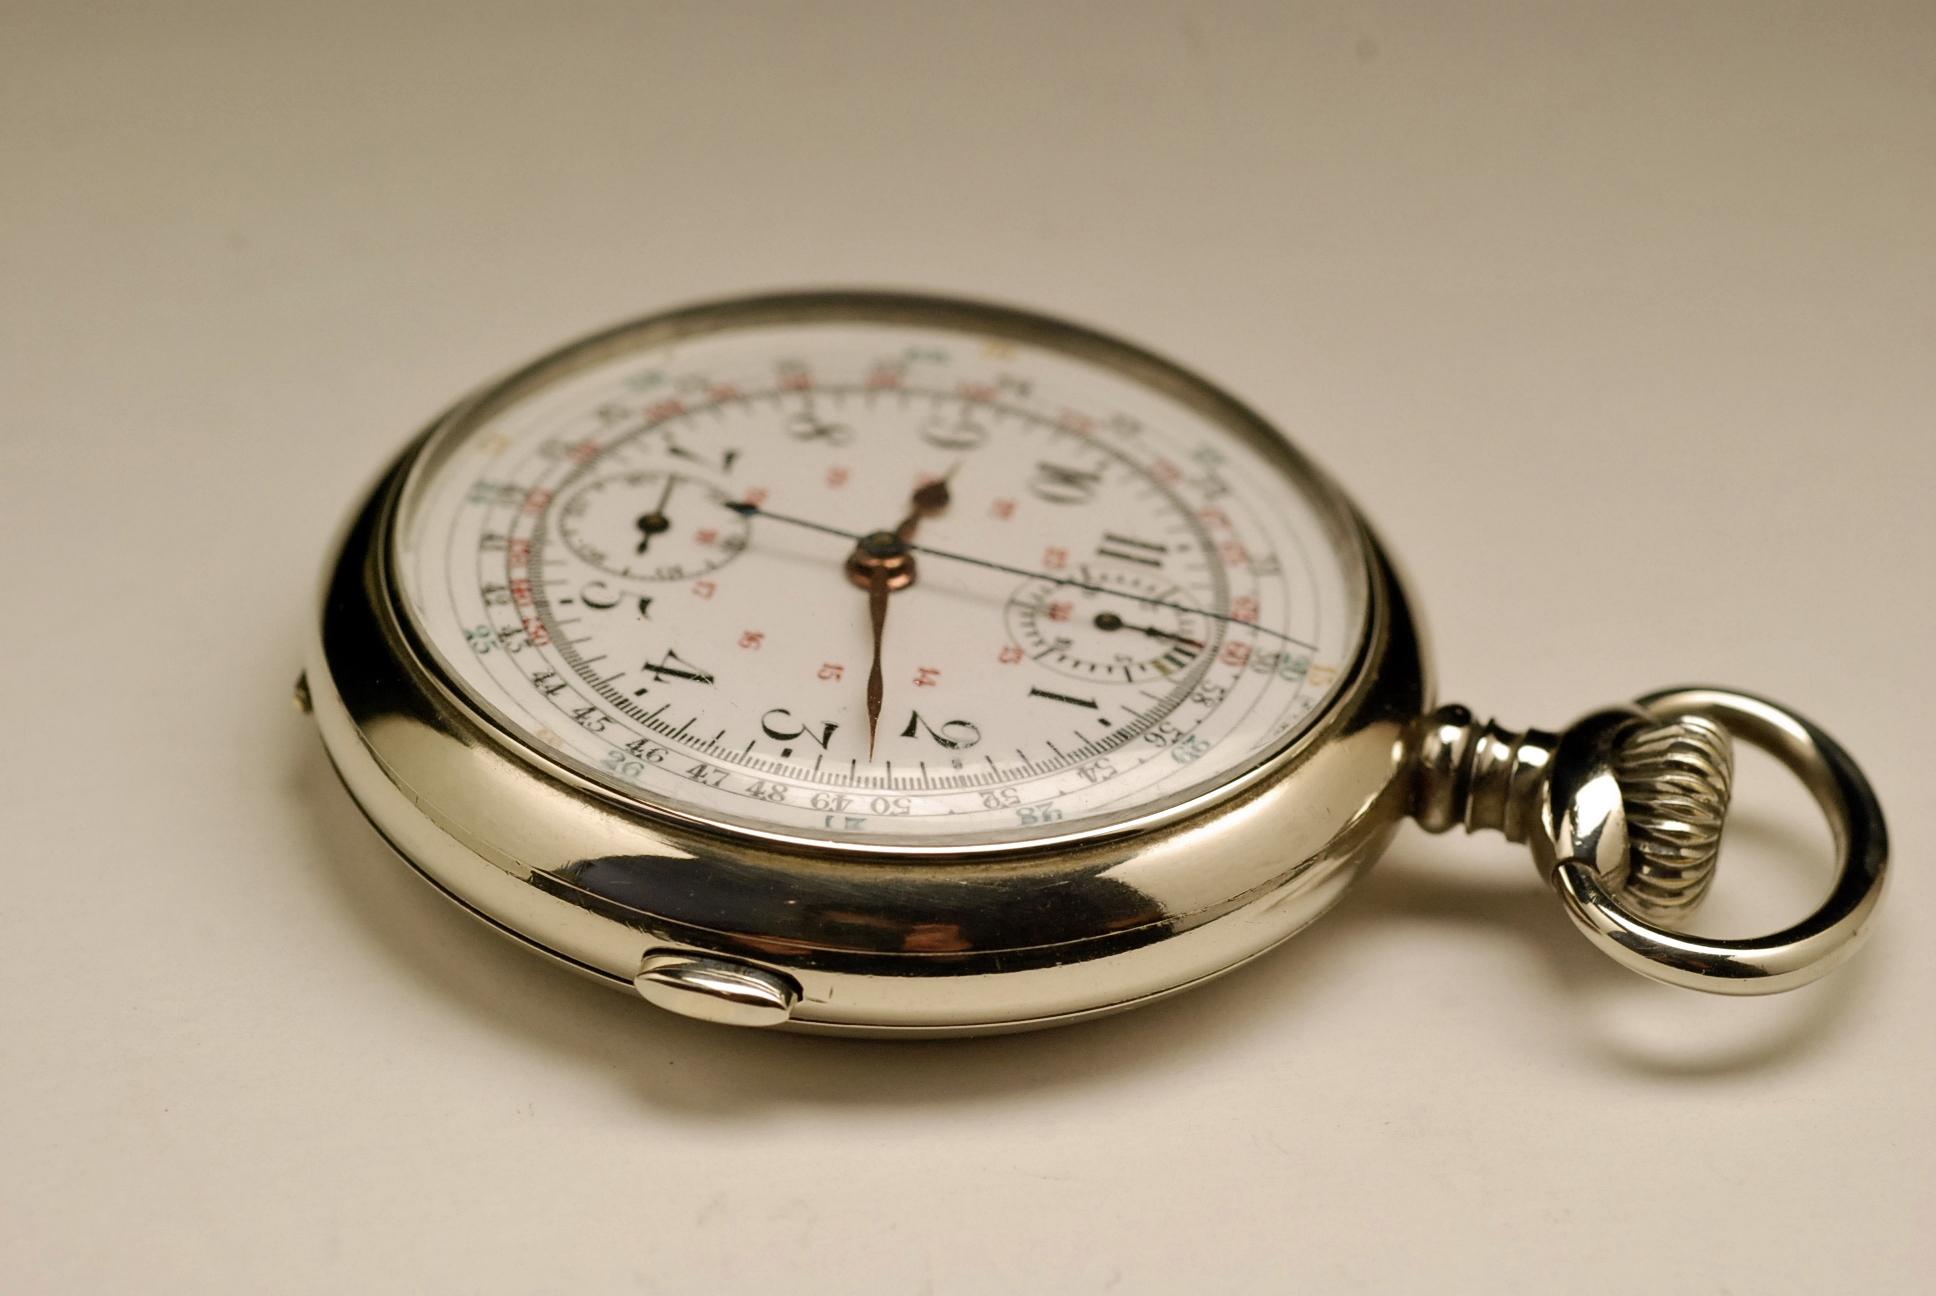 ancienne montre gousset chronographe valjoux 1910 vintage. Black Bedroom Furniture Sets. Home Design Ideas